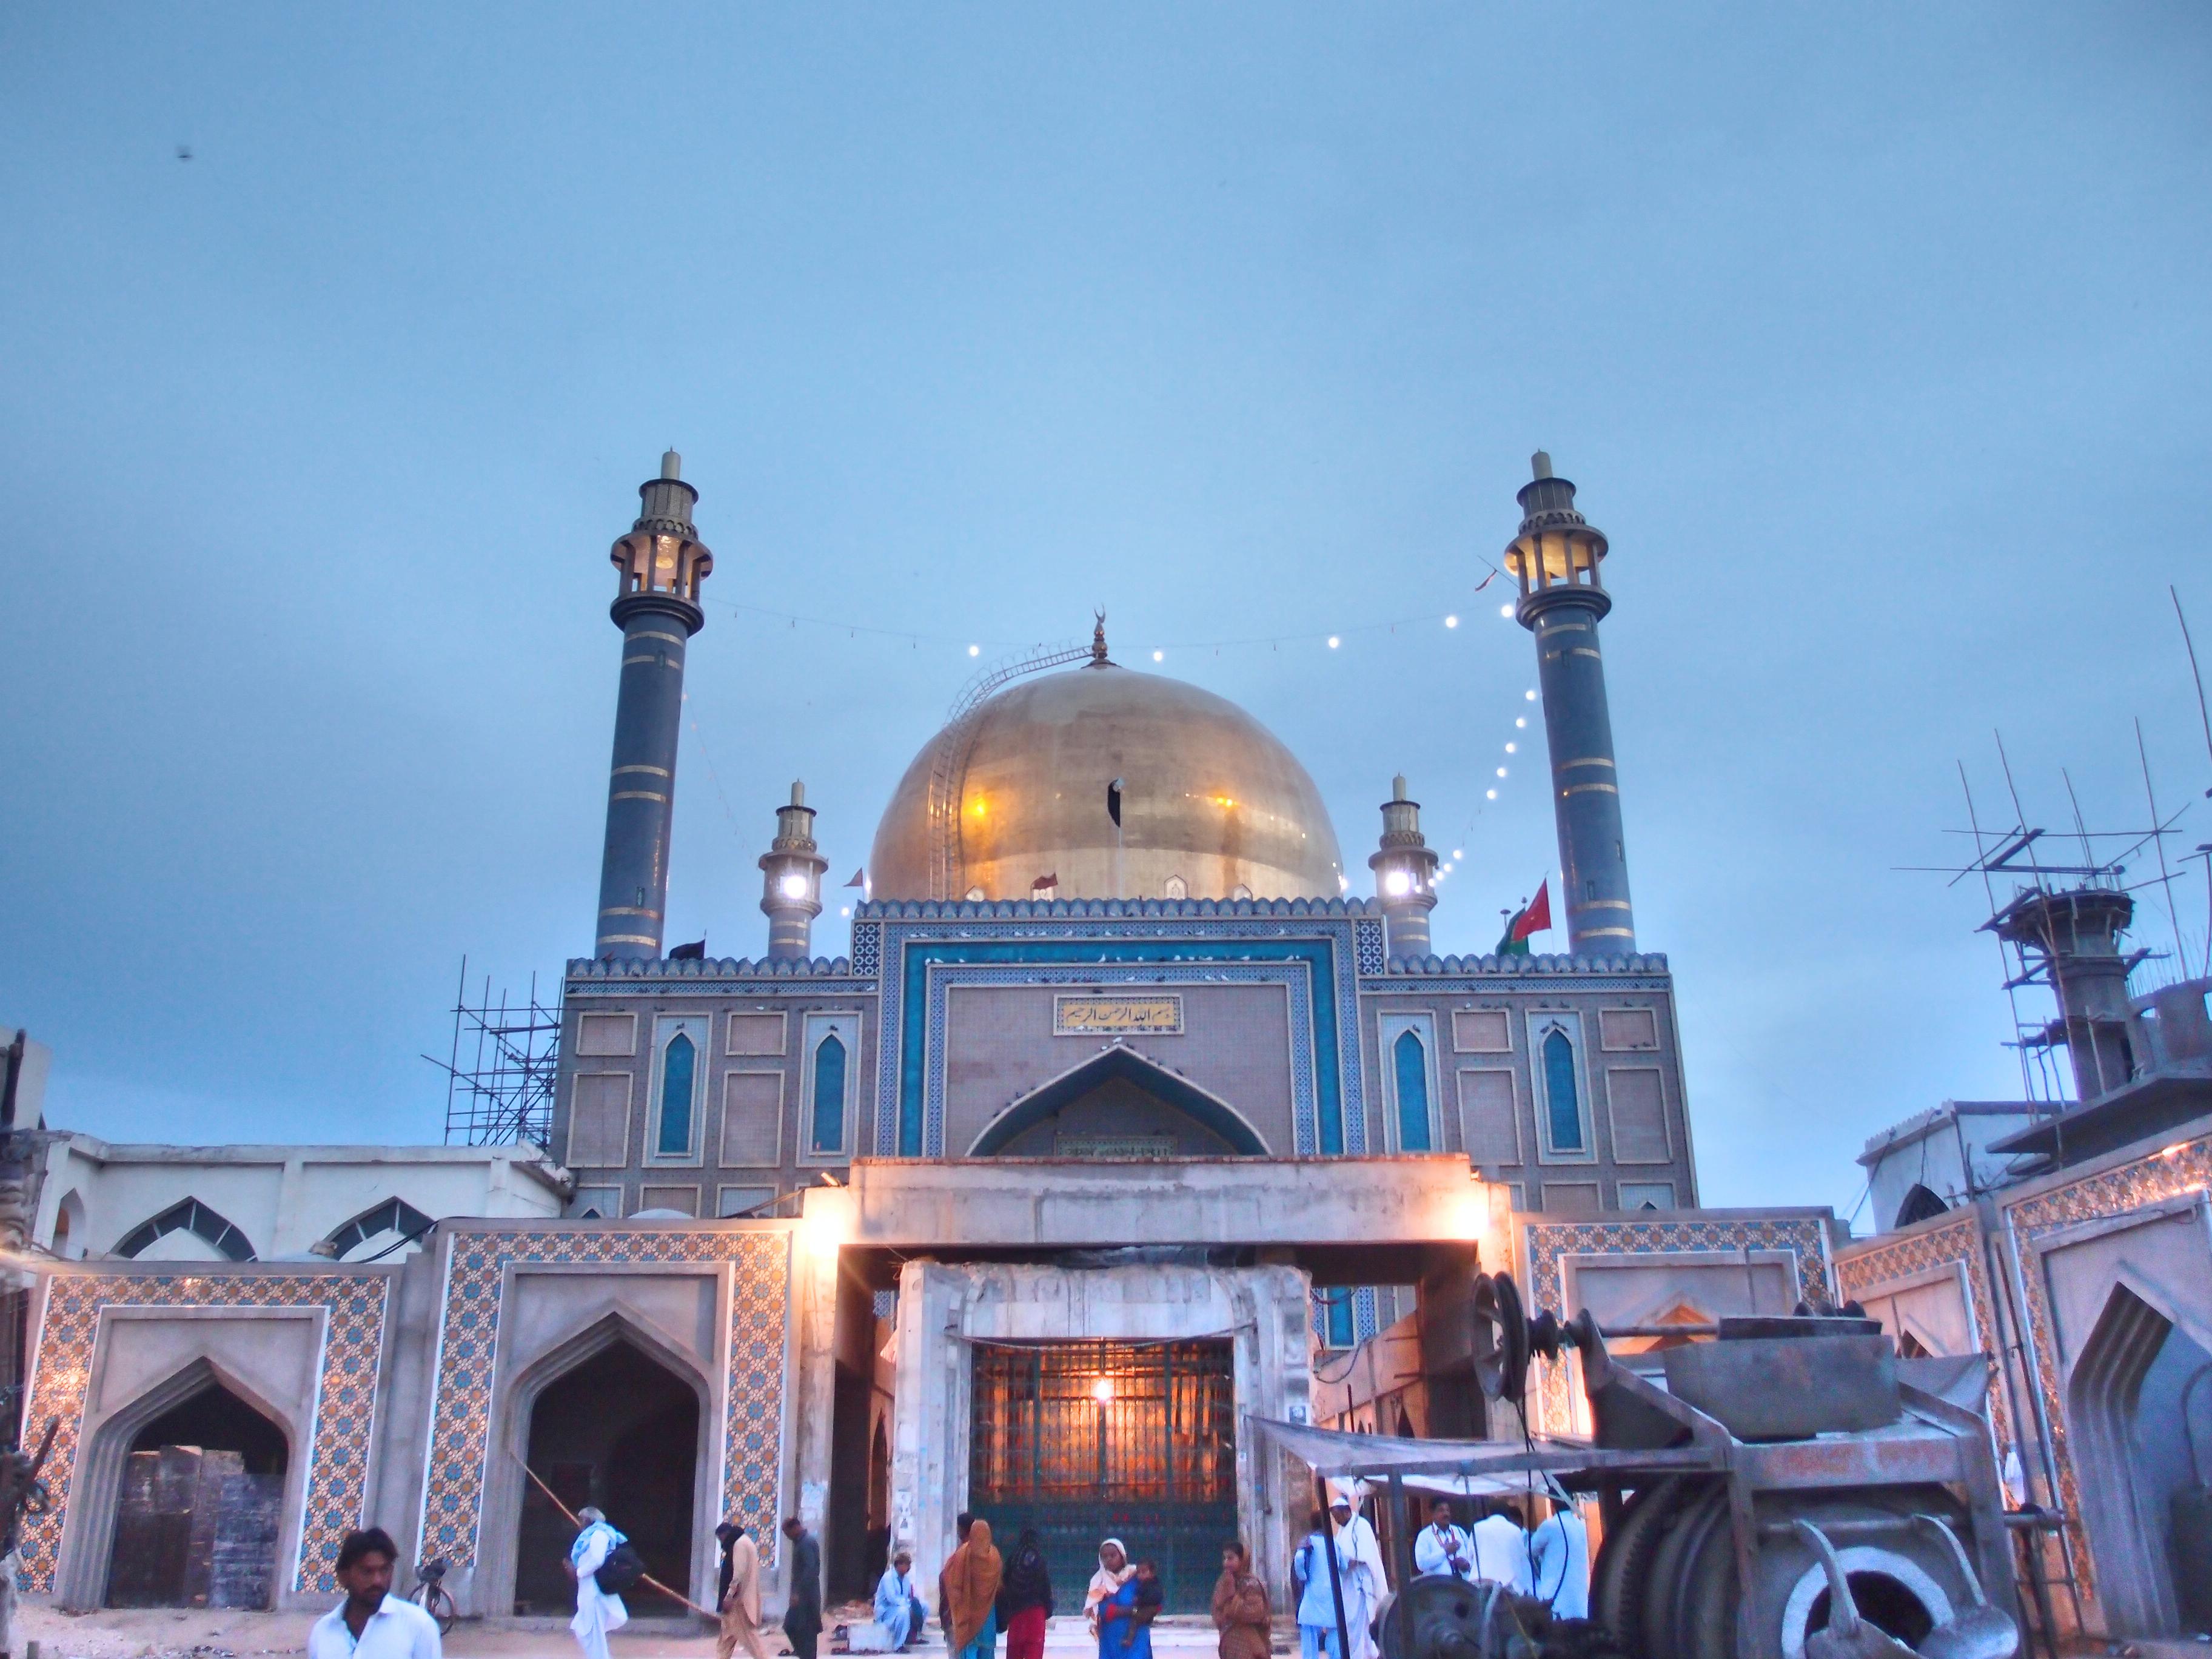 File:Shrine of Lal Shahbaz Qalandar view4.JPG - Wikimedia ...